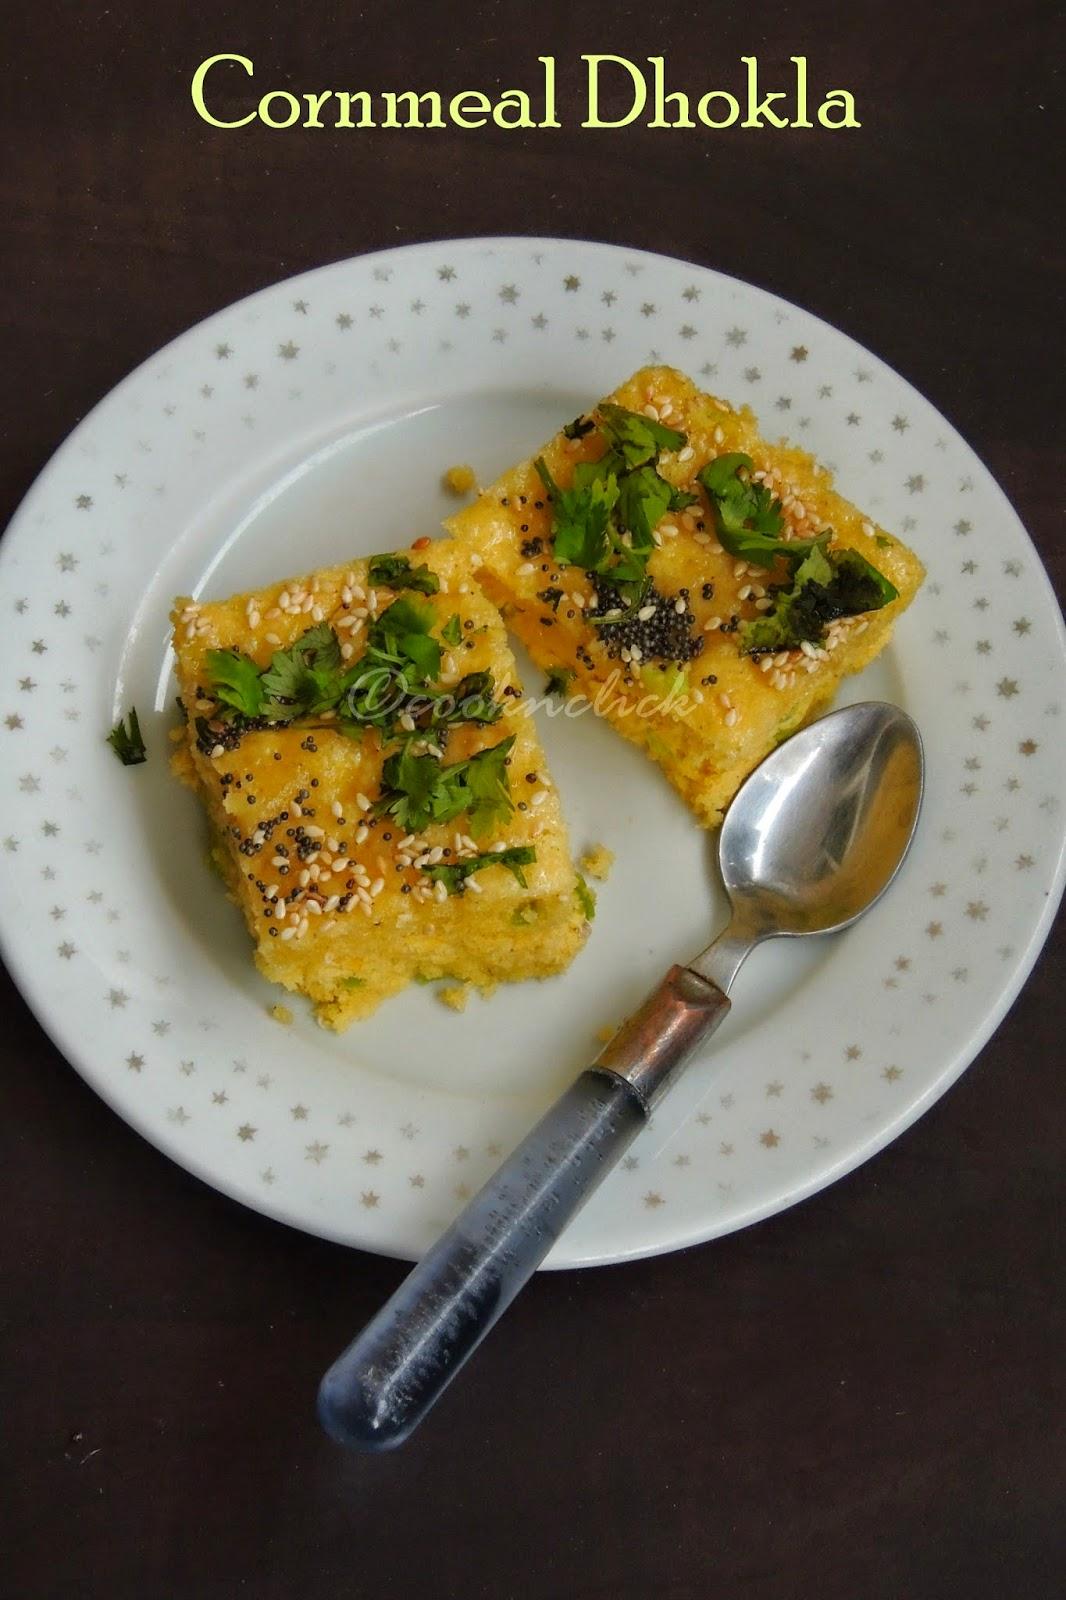 Makka ka atta dhokla, cornmeal dhokla